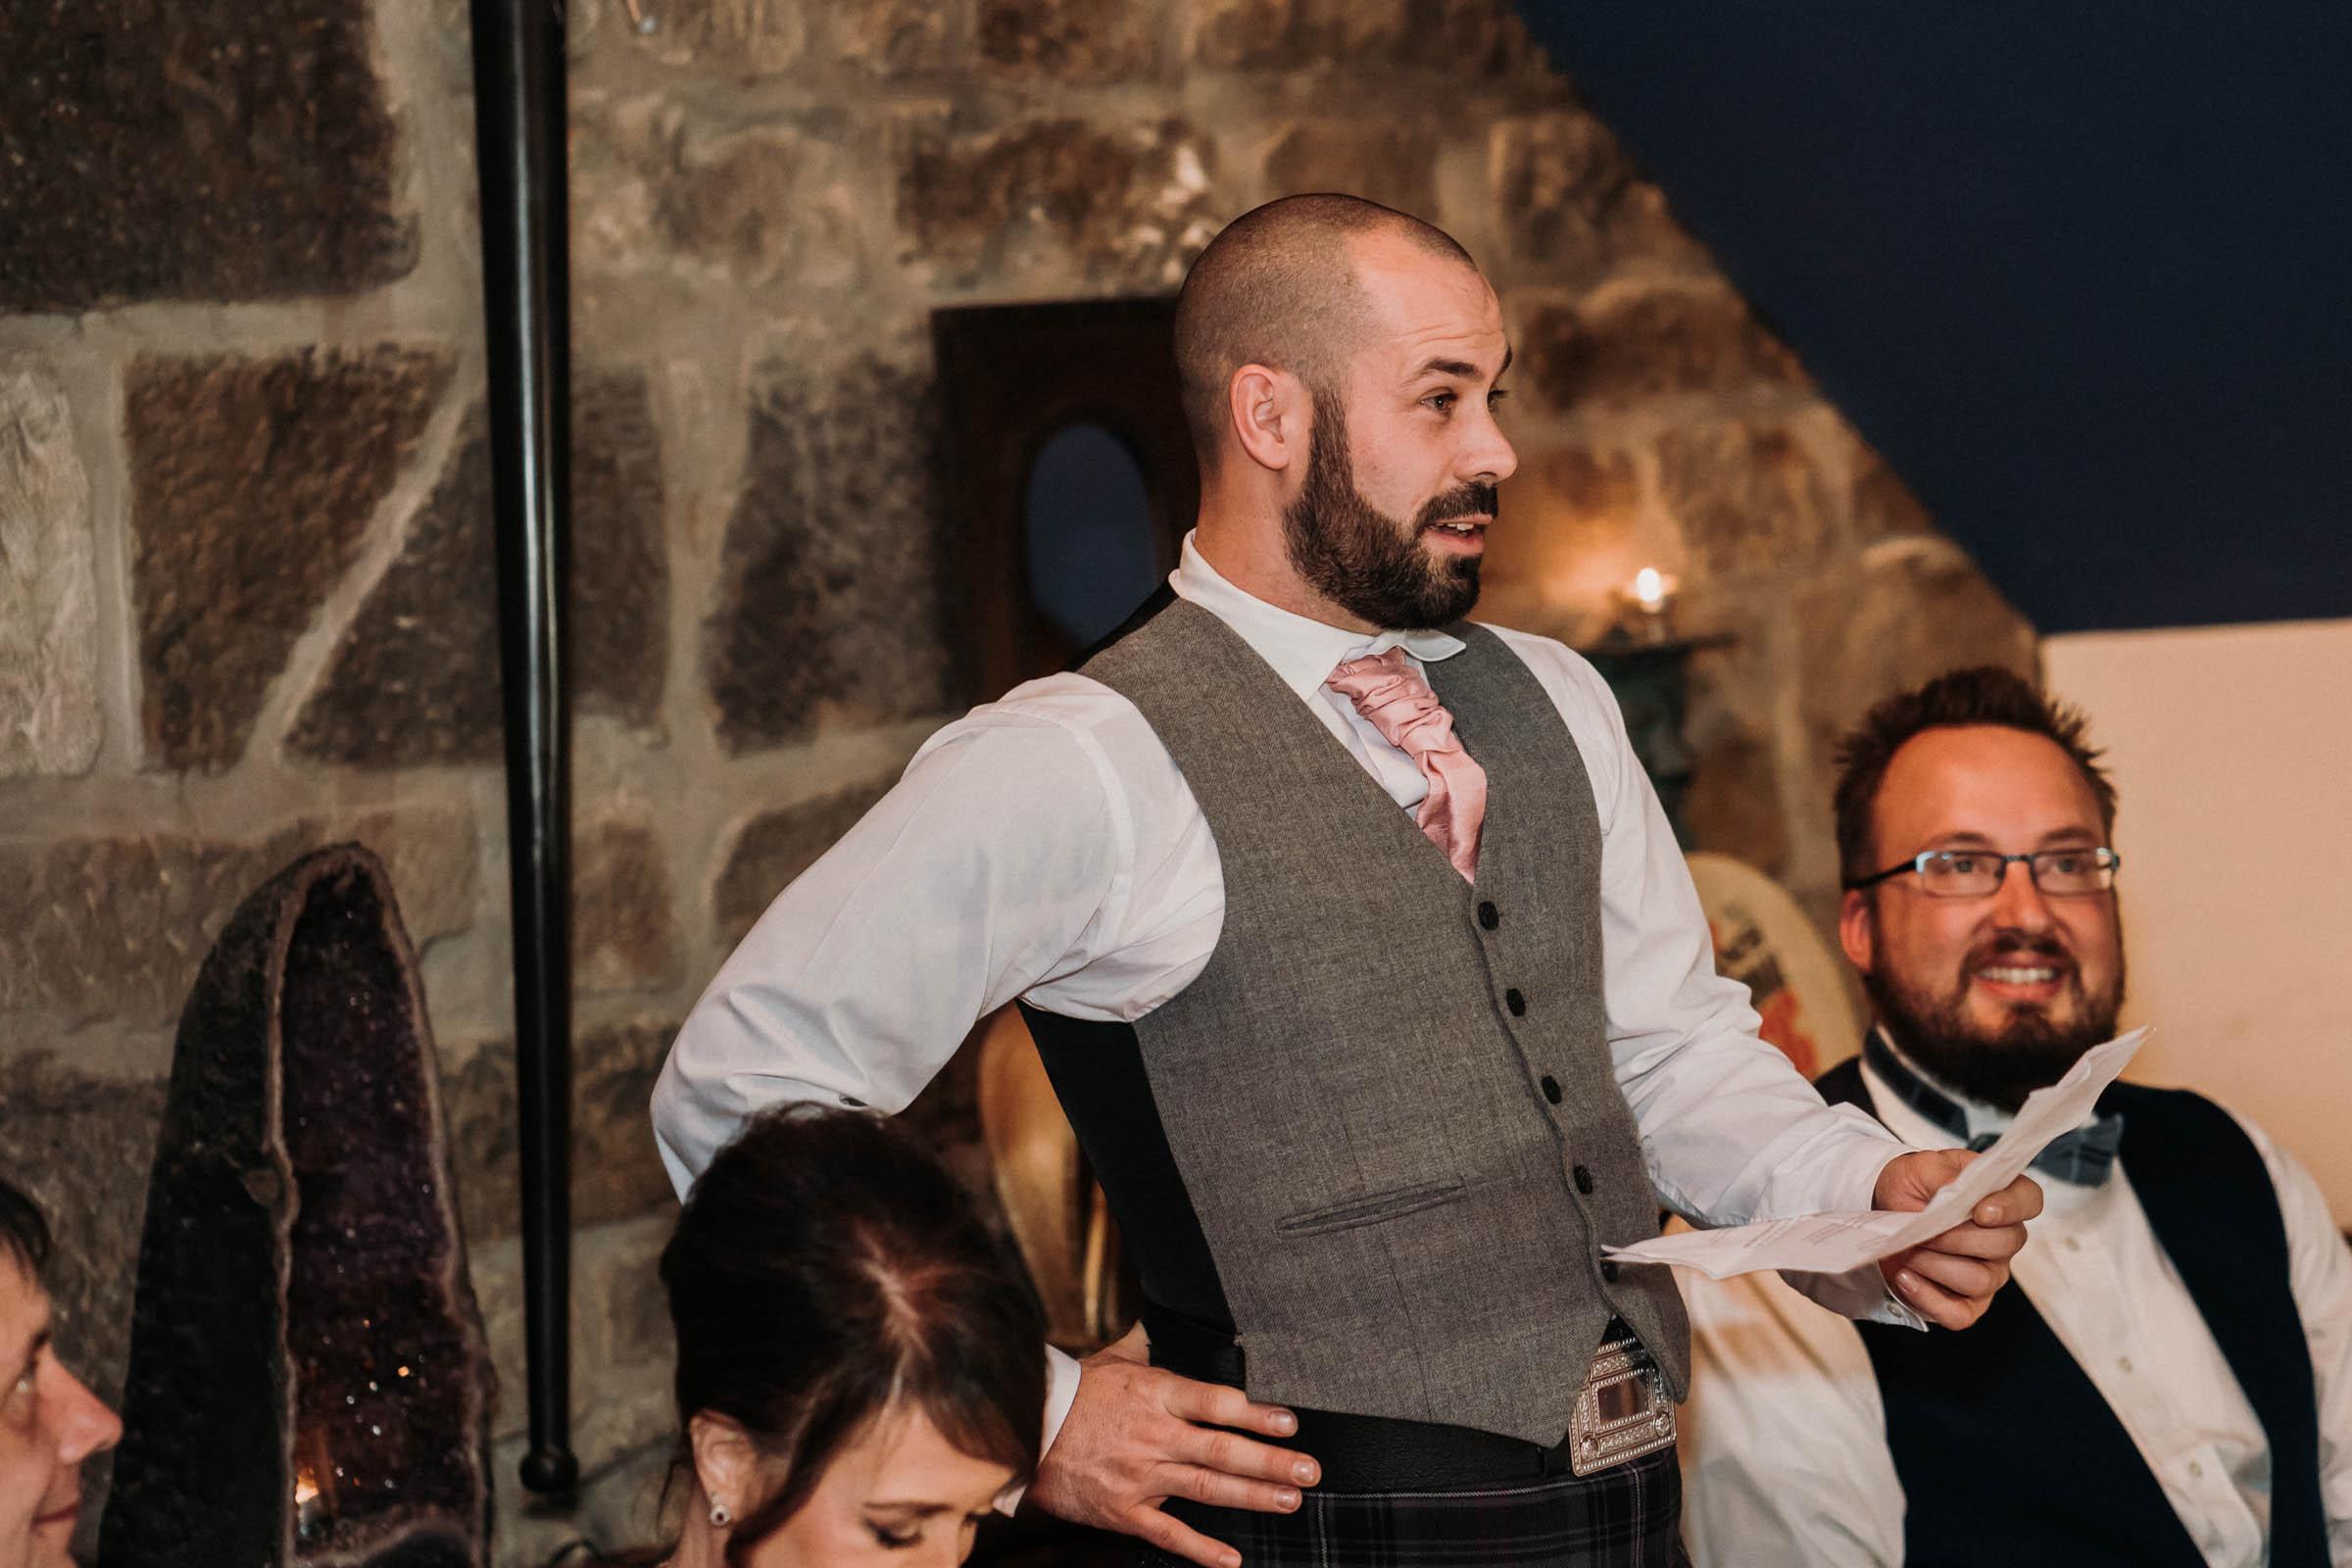 Oran-Mor-Wedding-Photographer-DearlyPhotography (39 of 55).jpg